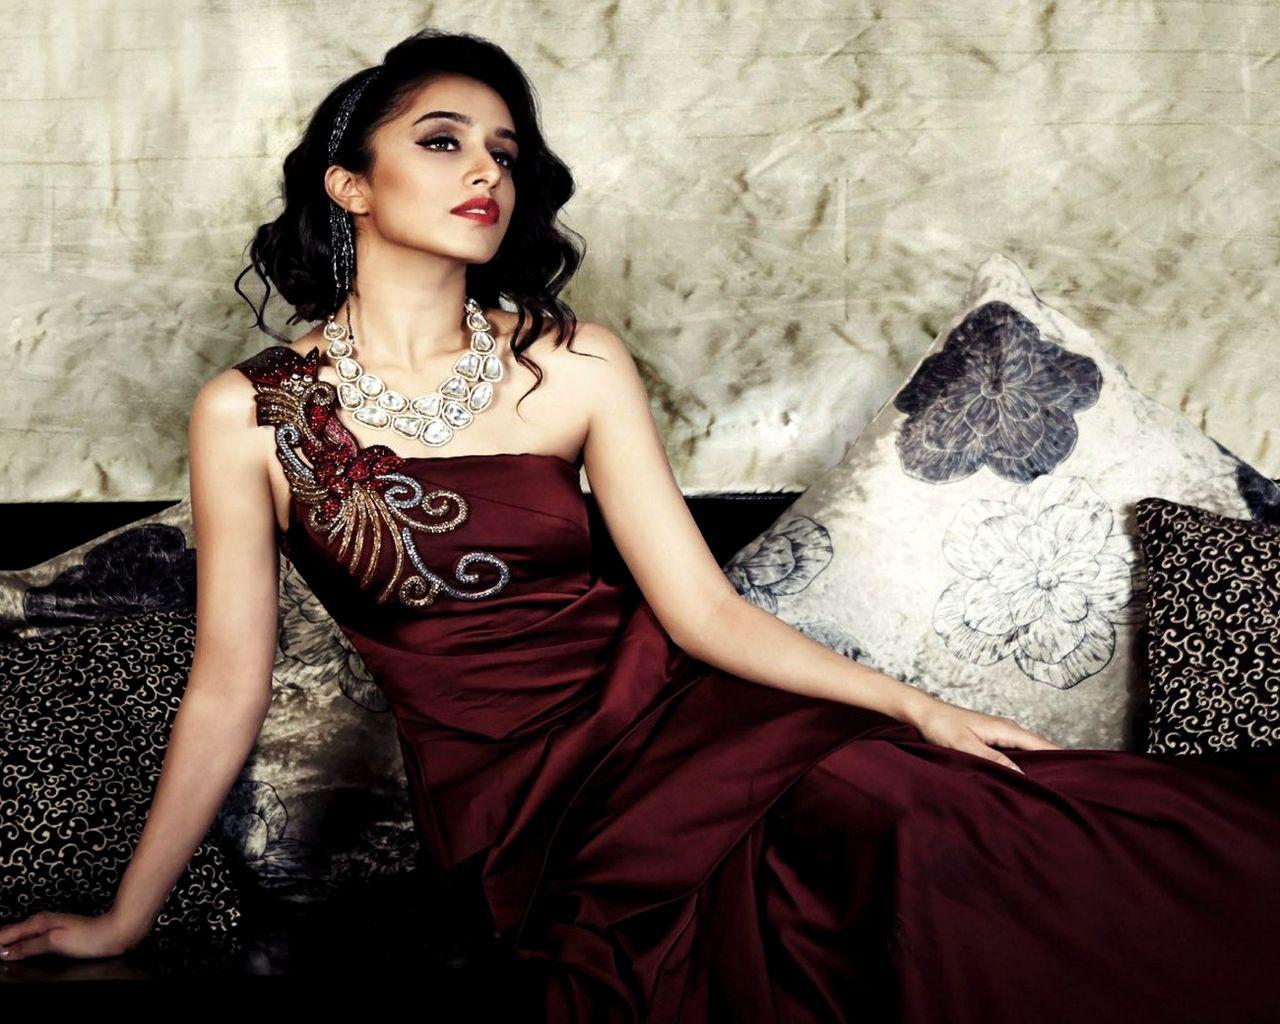 Download Bollywood Actress Hd Wallpapers 1080p Free: Shraddha-kapoor Images Latests Free Download Hd Dp 1080p